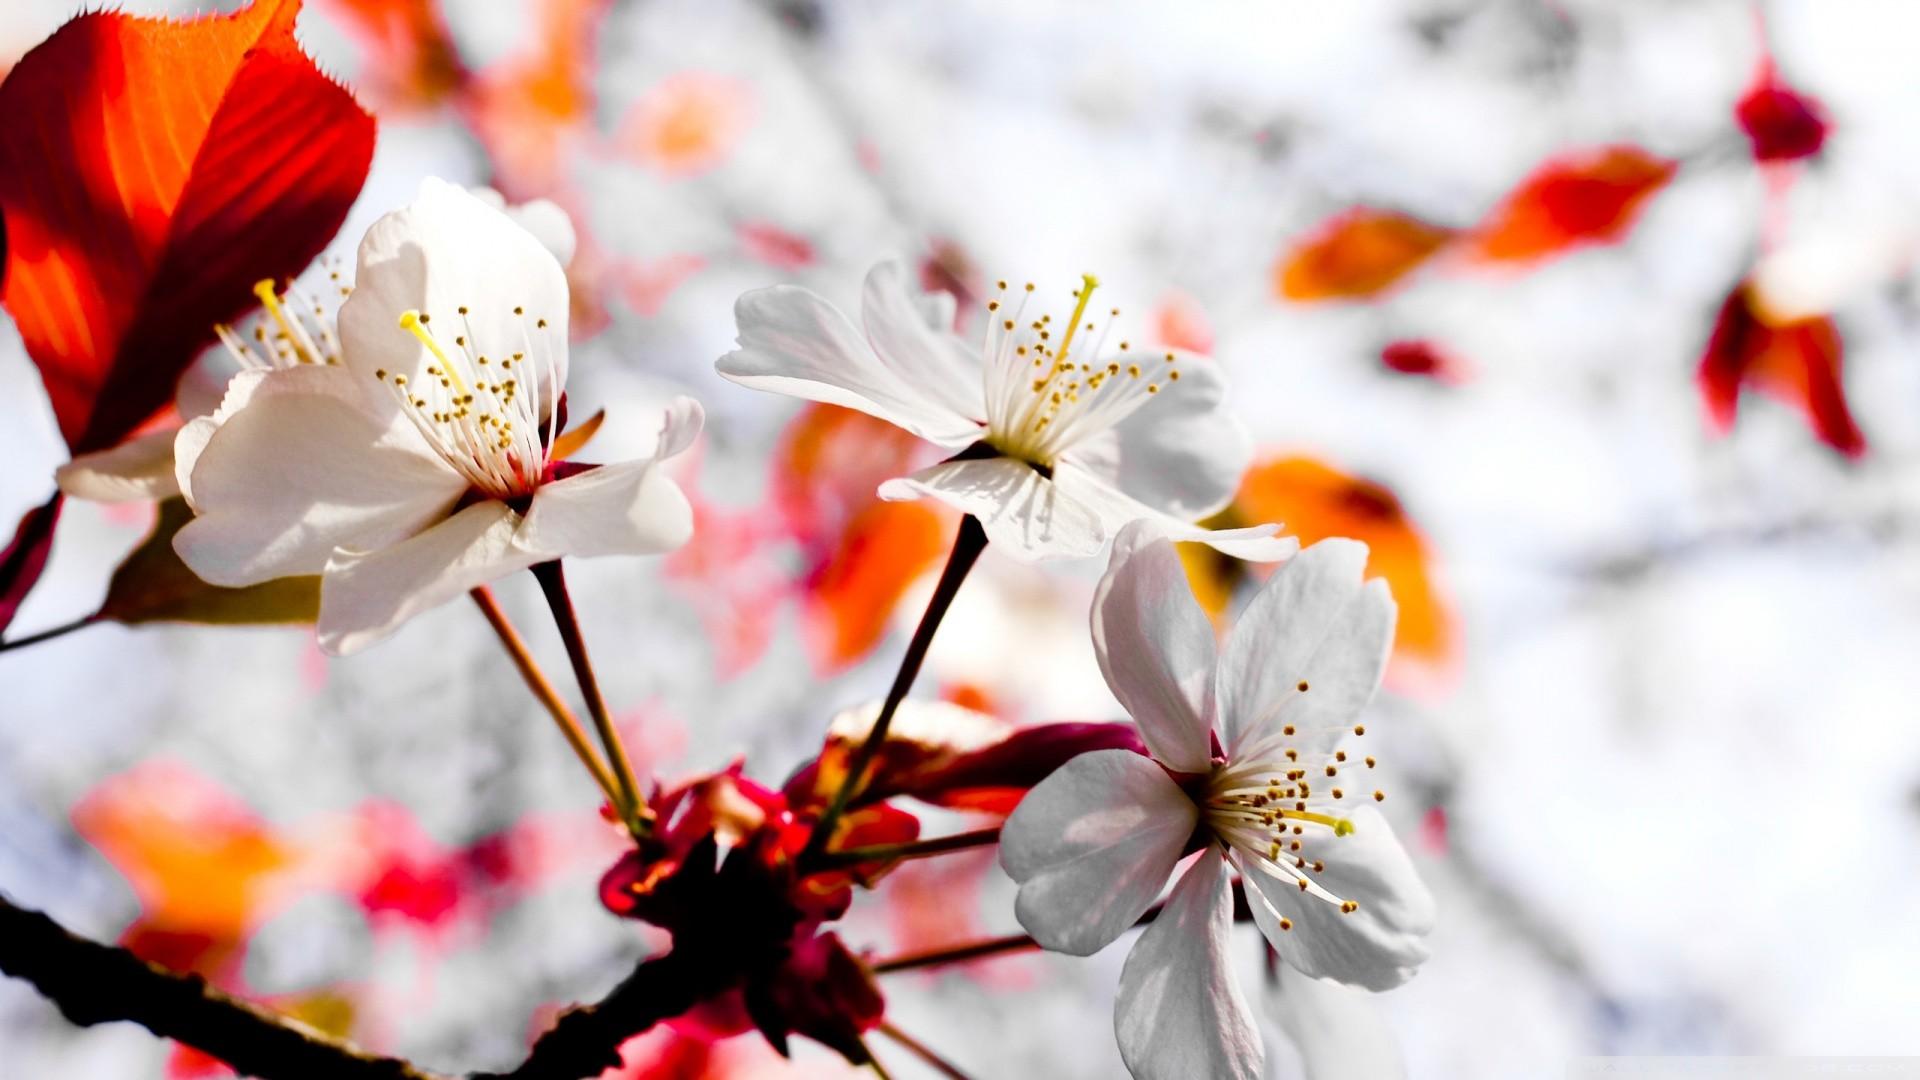 April Spring Flowers Desktop Wallpaper Data Src Full Screen Hd Wallpaper 4k 1920x1080 Wallpaper Teahub Io